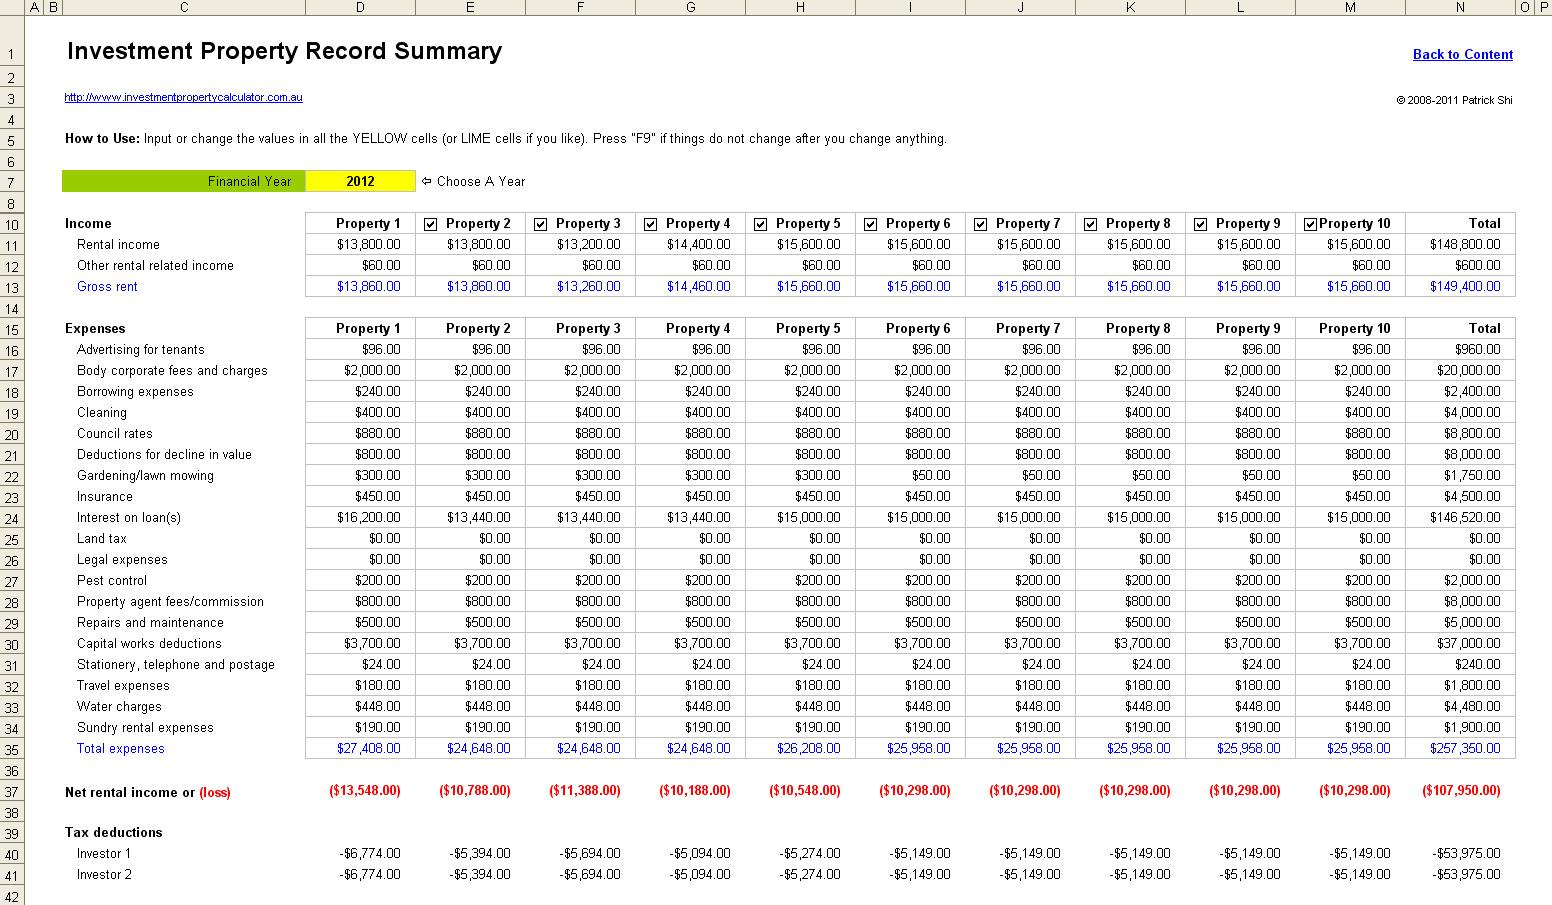 Property Management Spreadsheet Free Download For Free Rental Property Management Spreadsheet In Excel